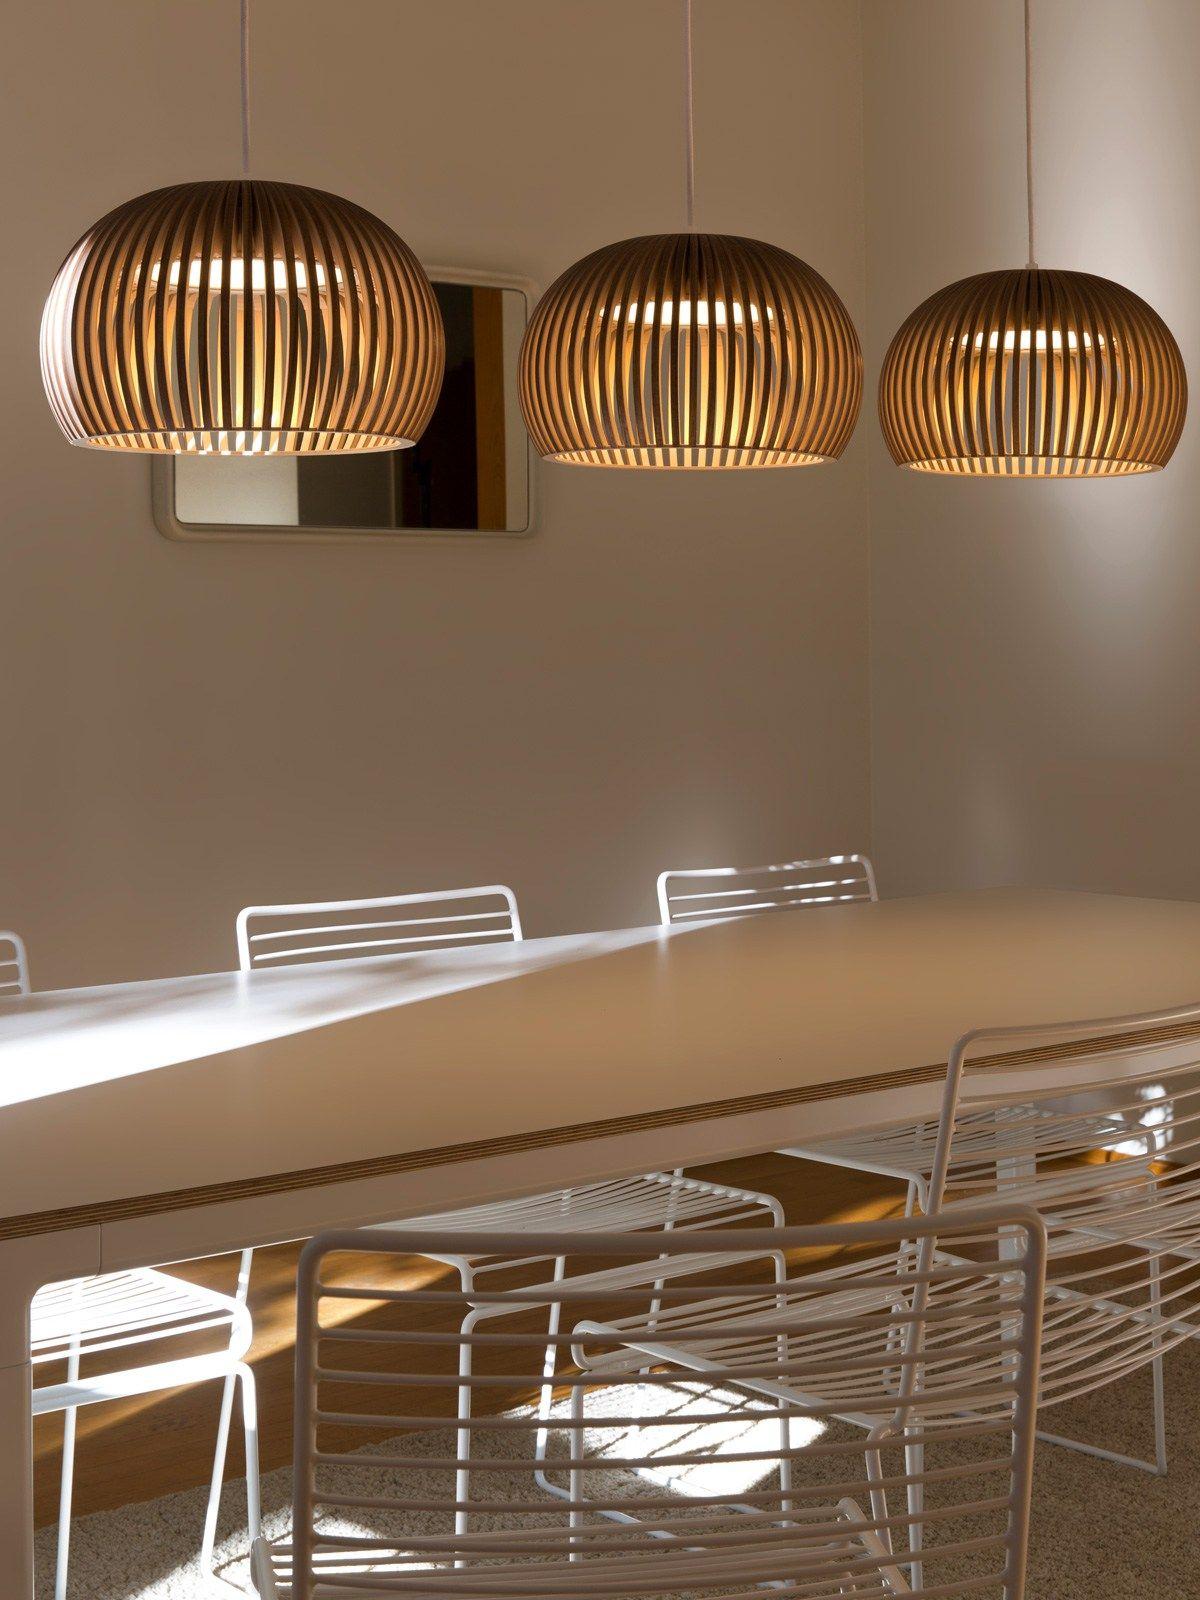 Kerflight P9 - DesignOrt.com  Design lampen, Lampe esszimmertisch